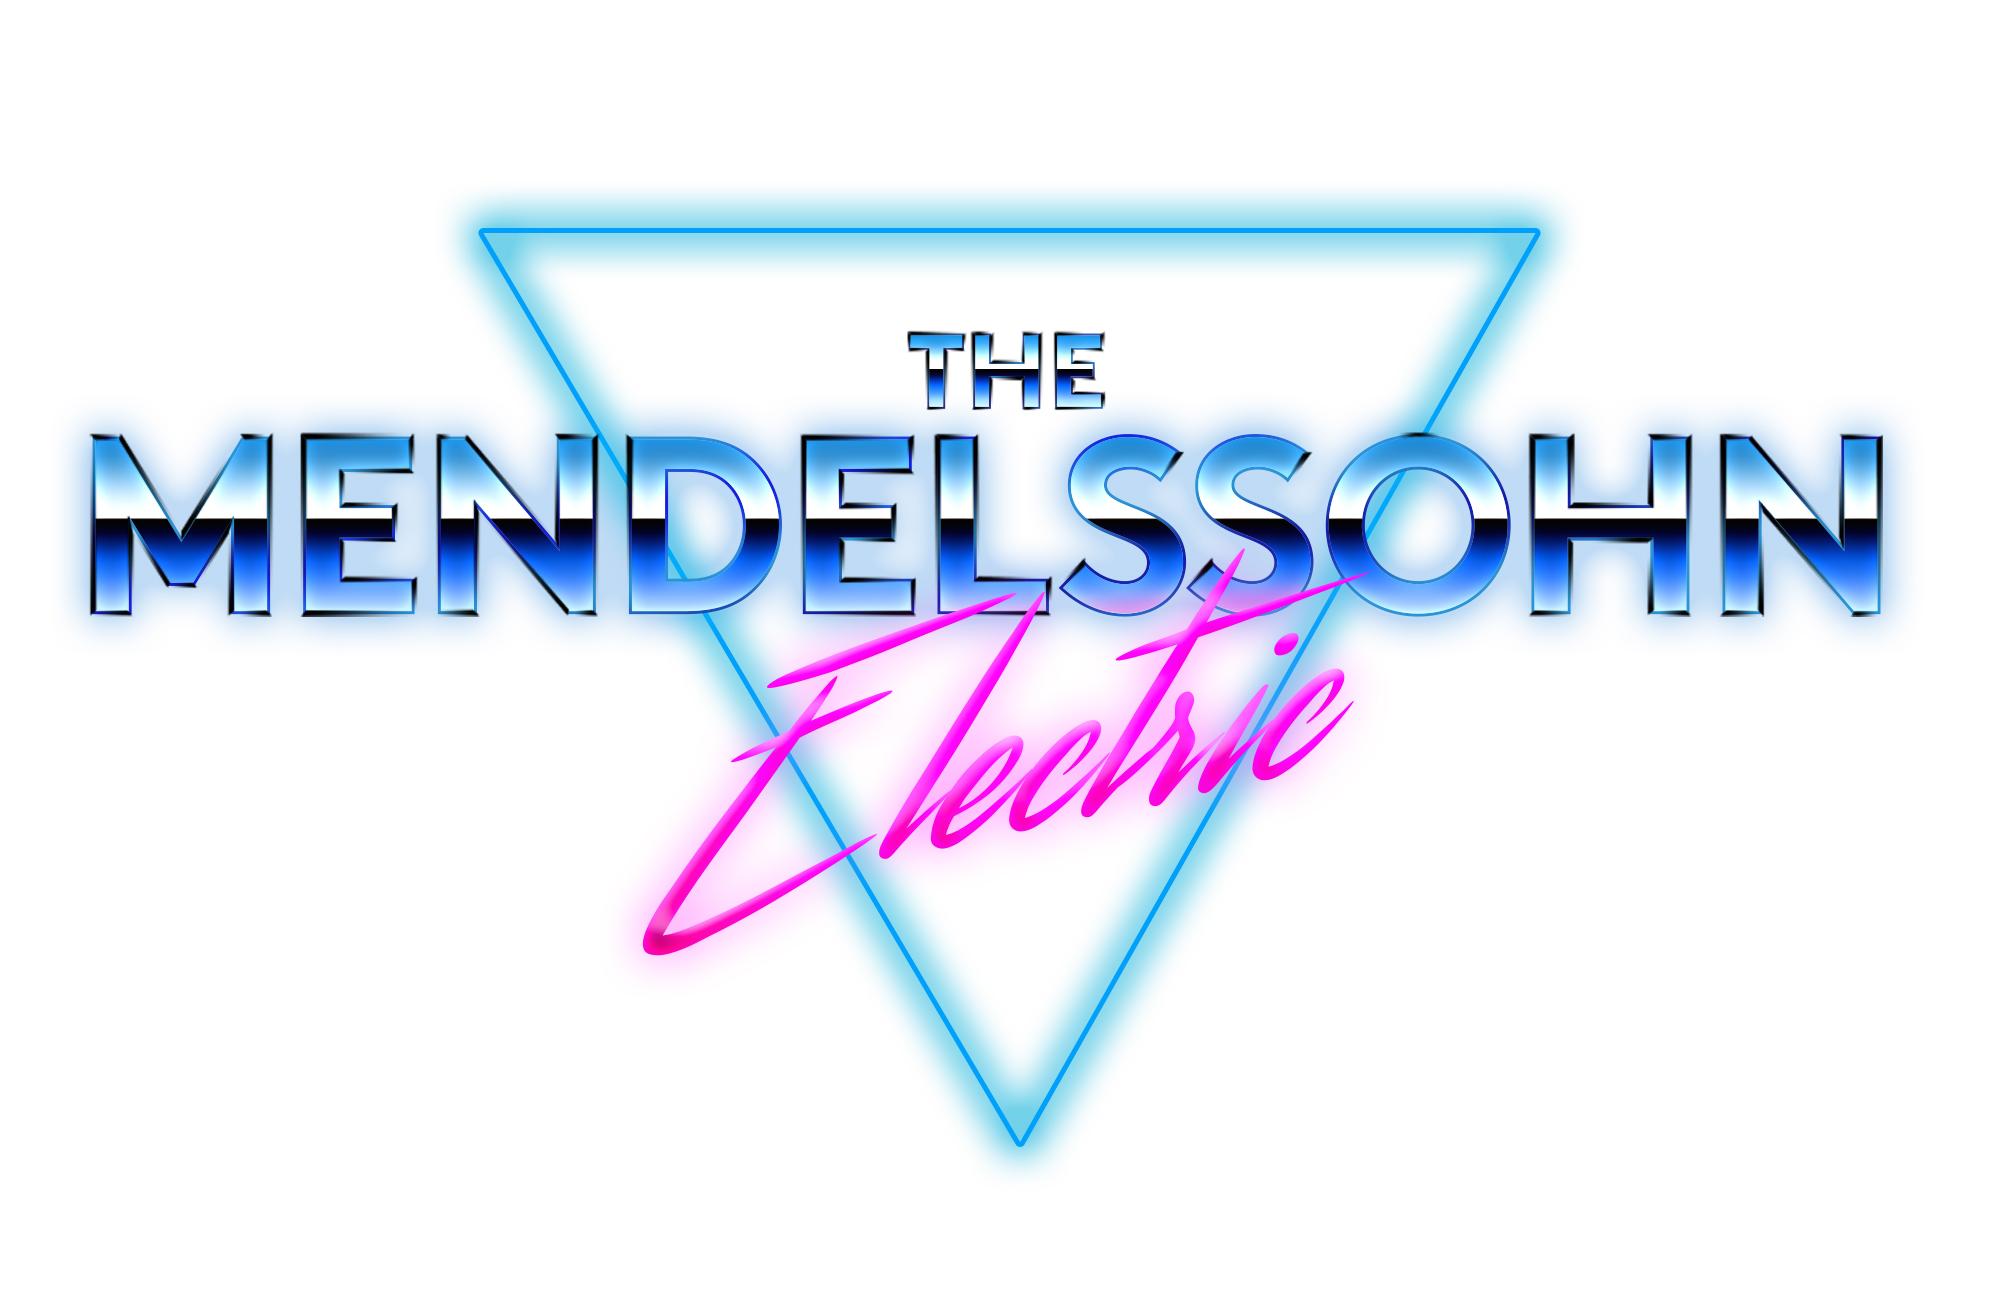 The-Mendelssohn-Electric(RGB).jpg